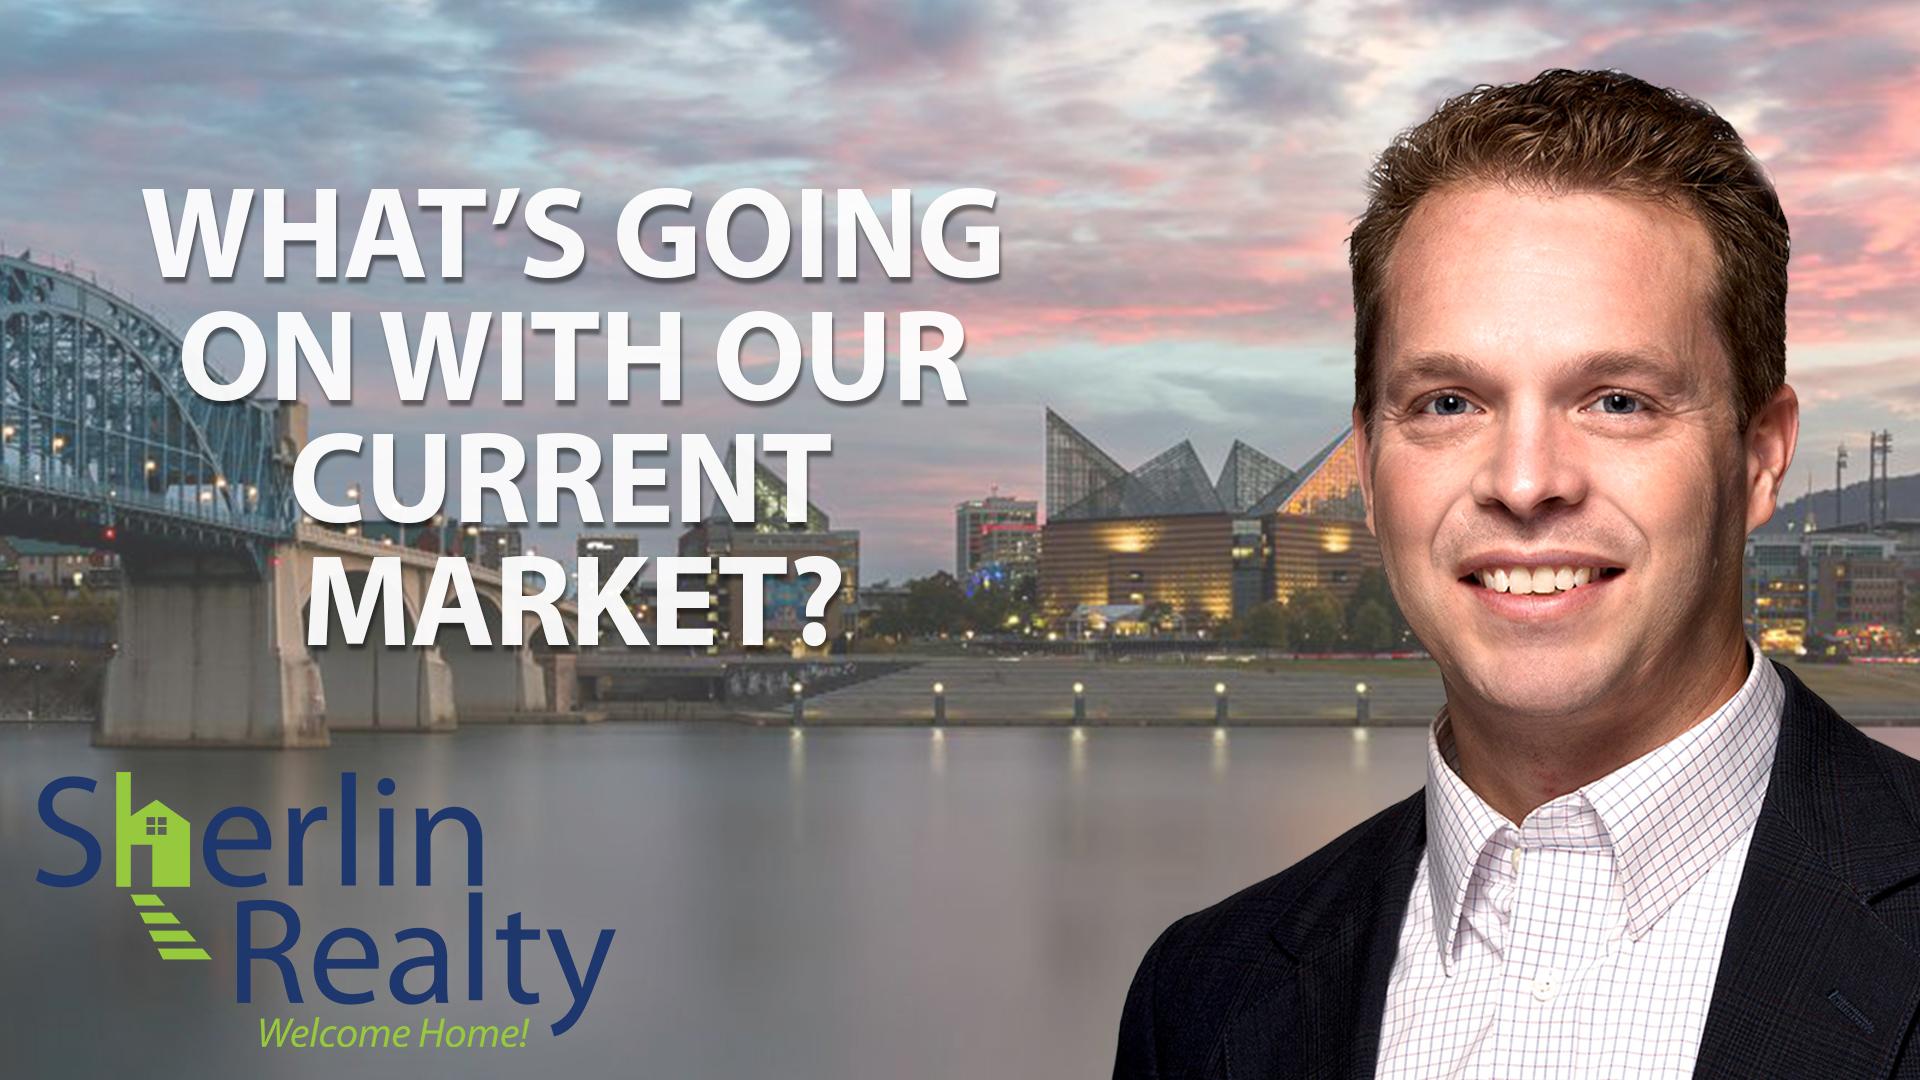 Our Market Is in a Unique Position